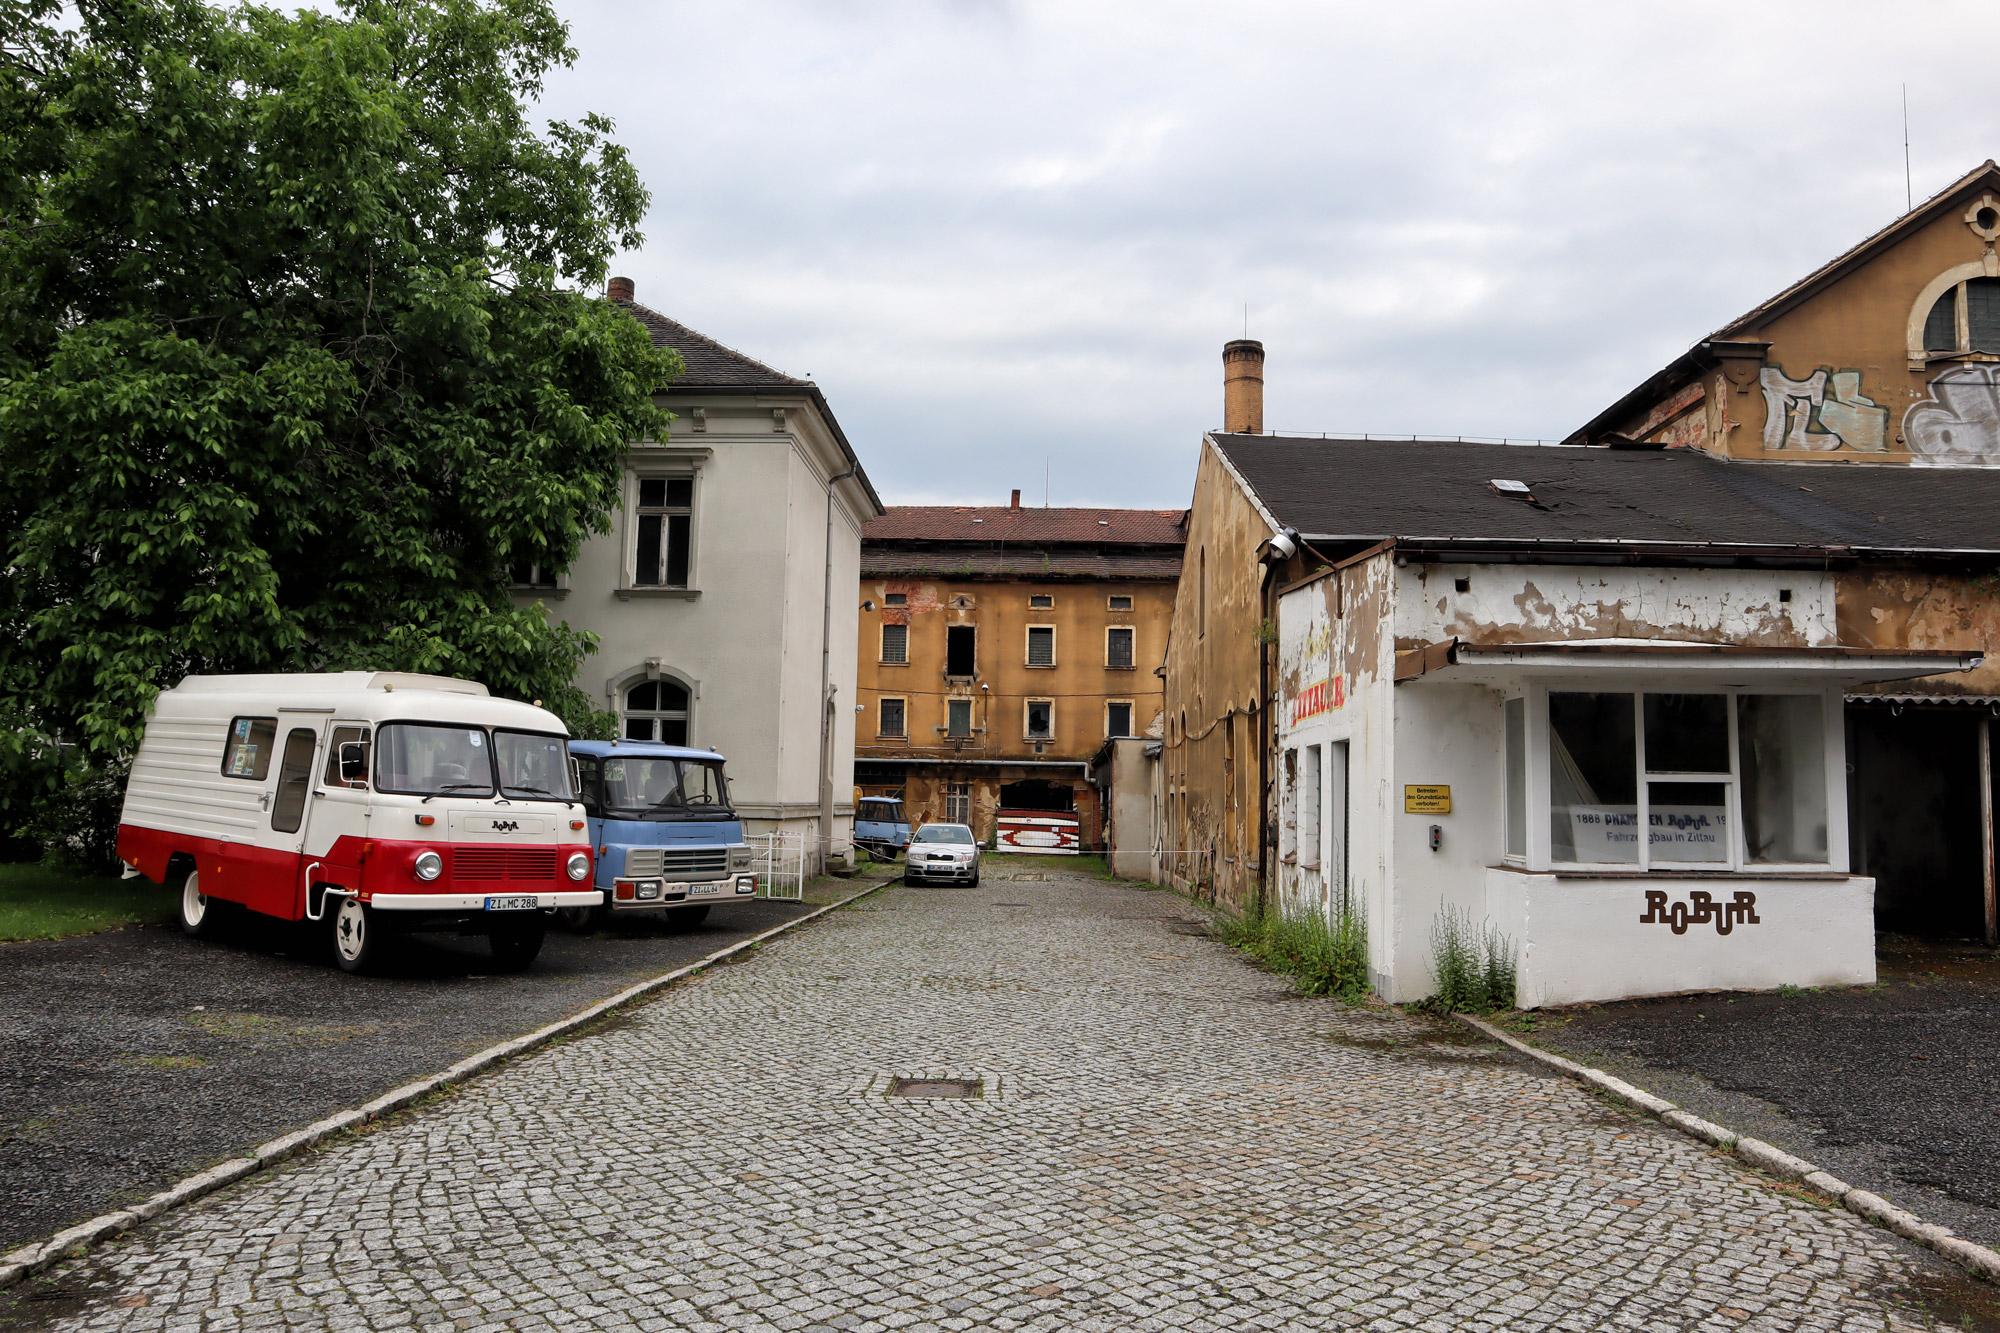 Zittau - Robur fabriek